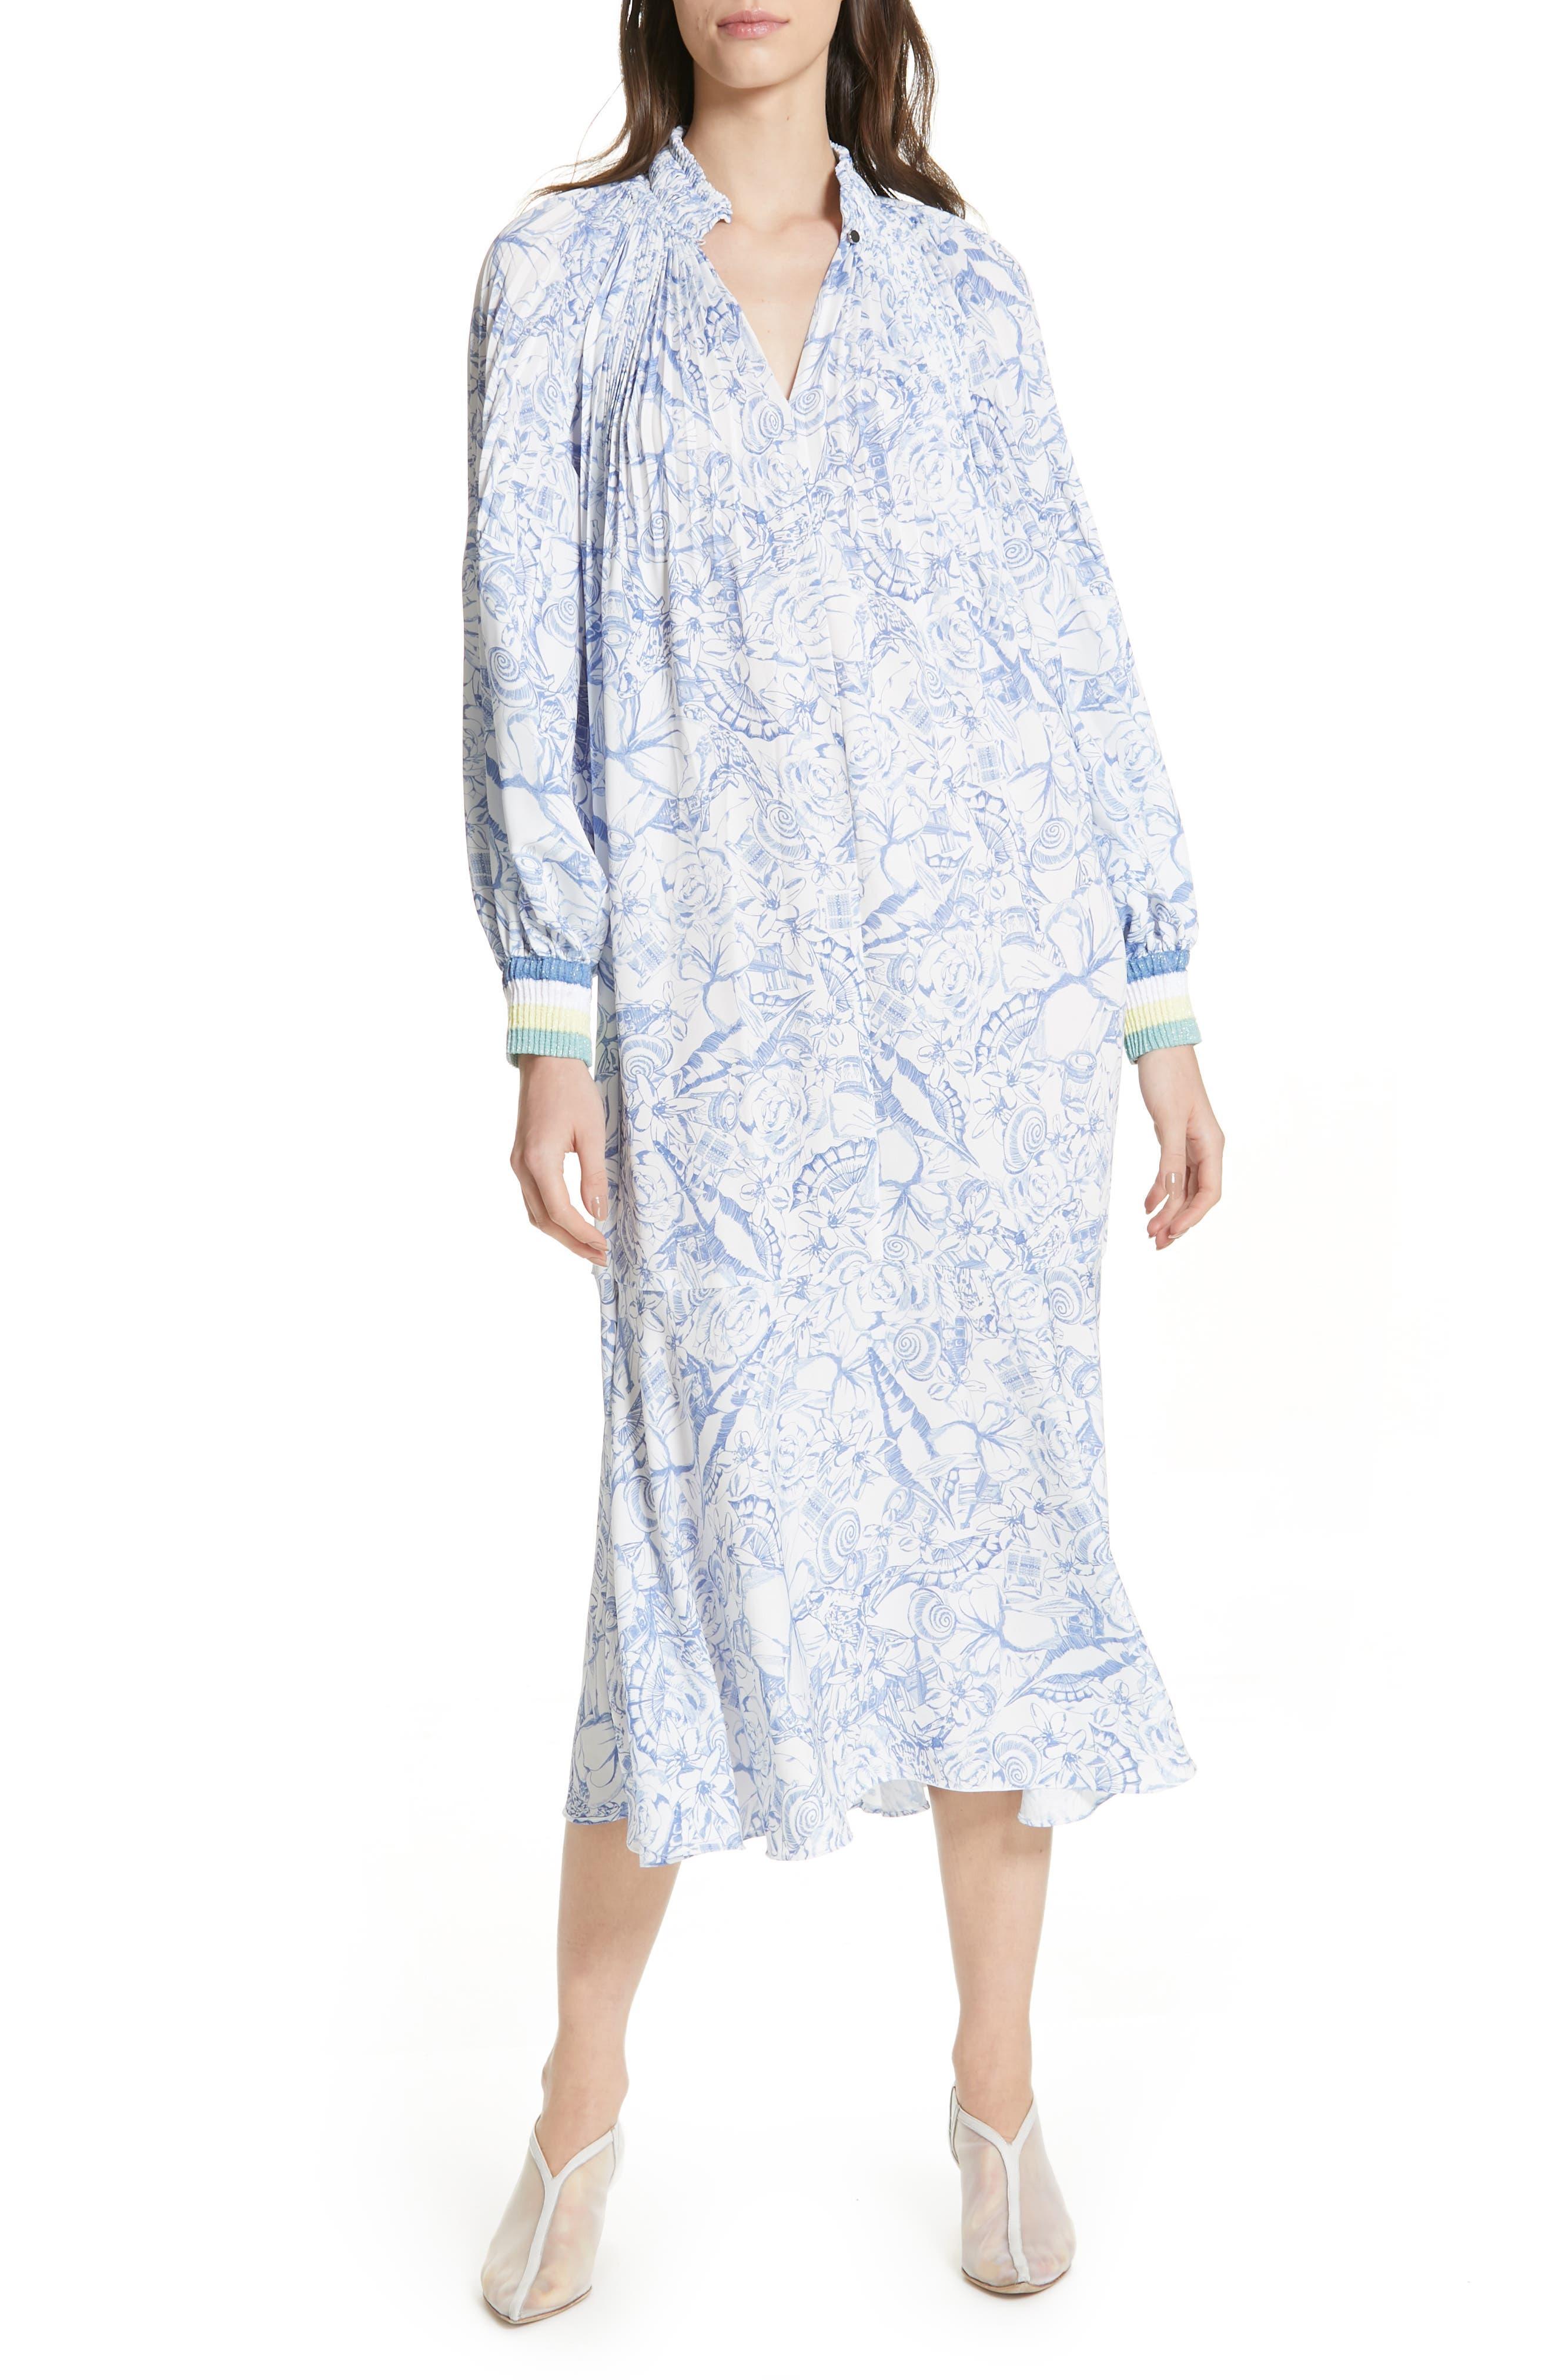 Tibi Isa Toile Print Ribbed Cuff Midi Dress, White